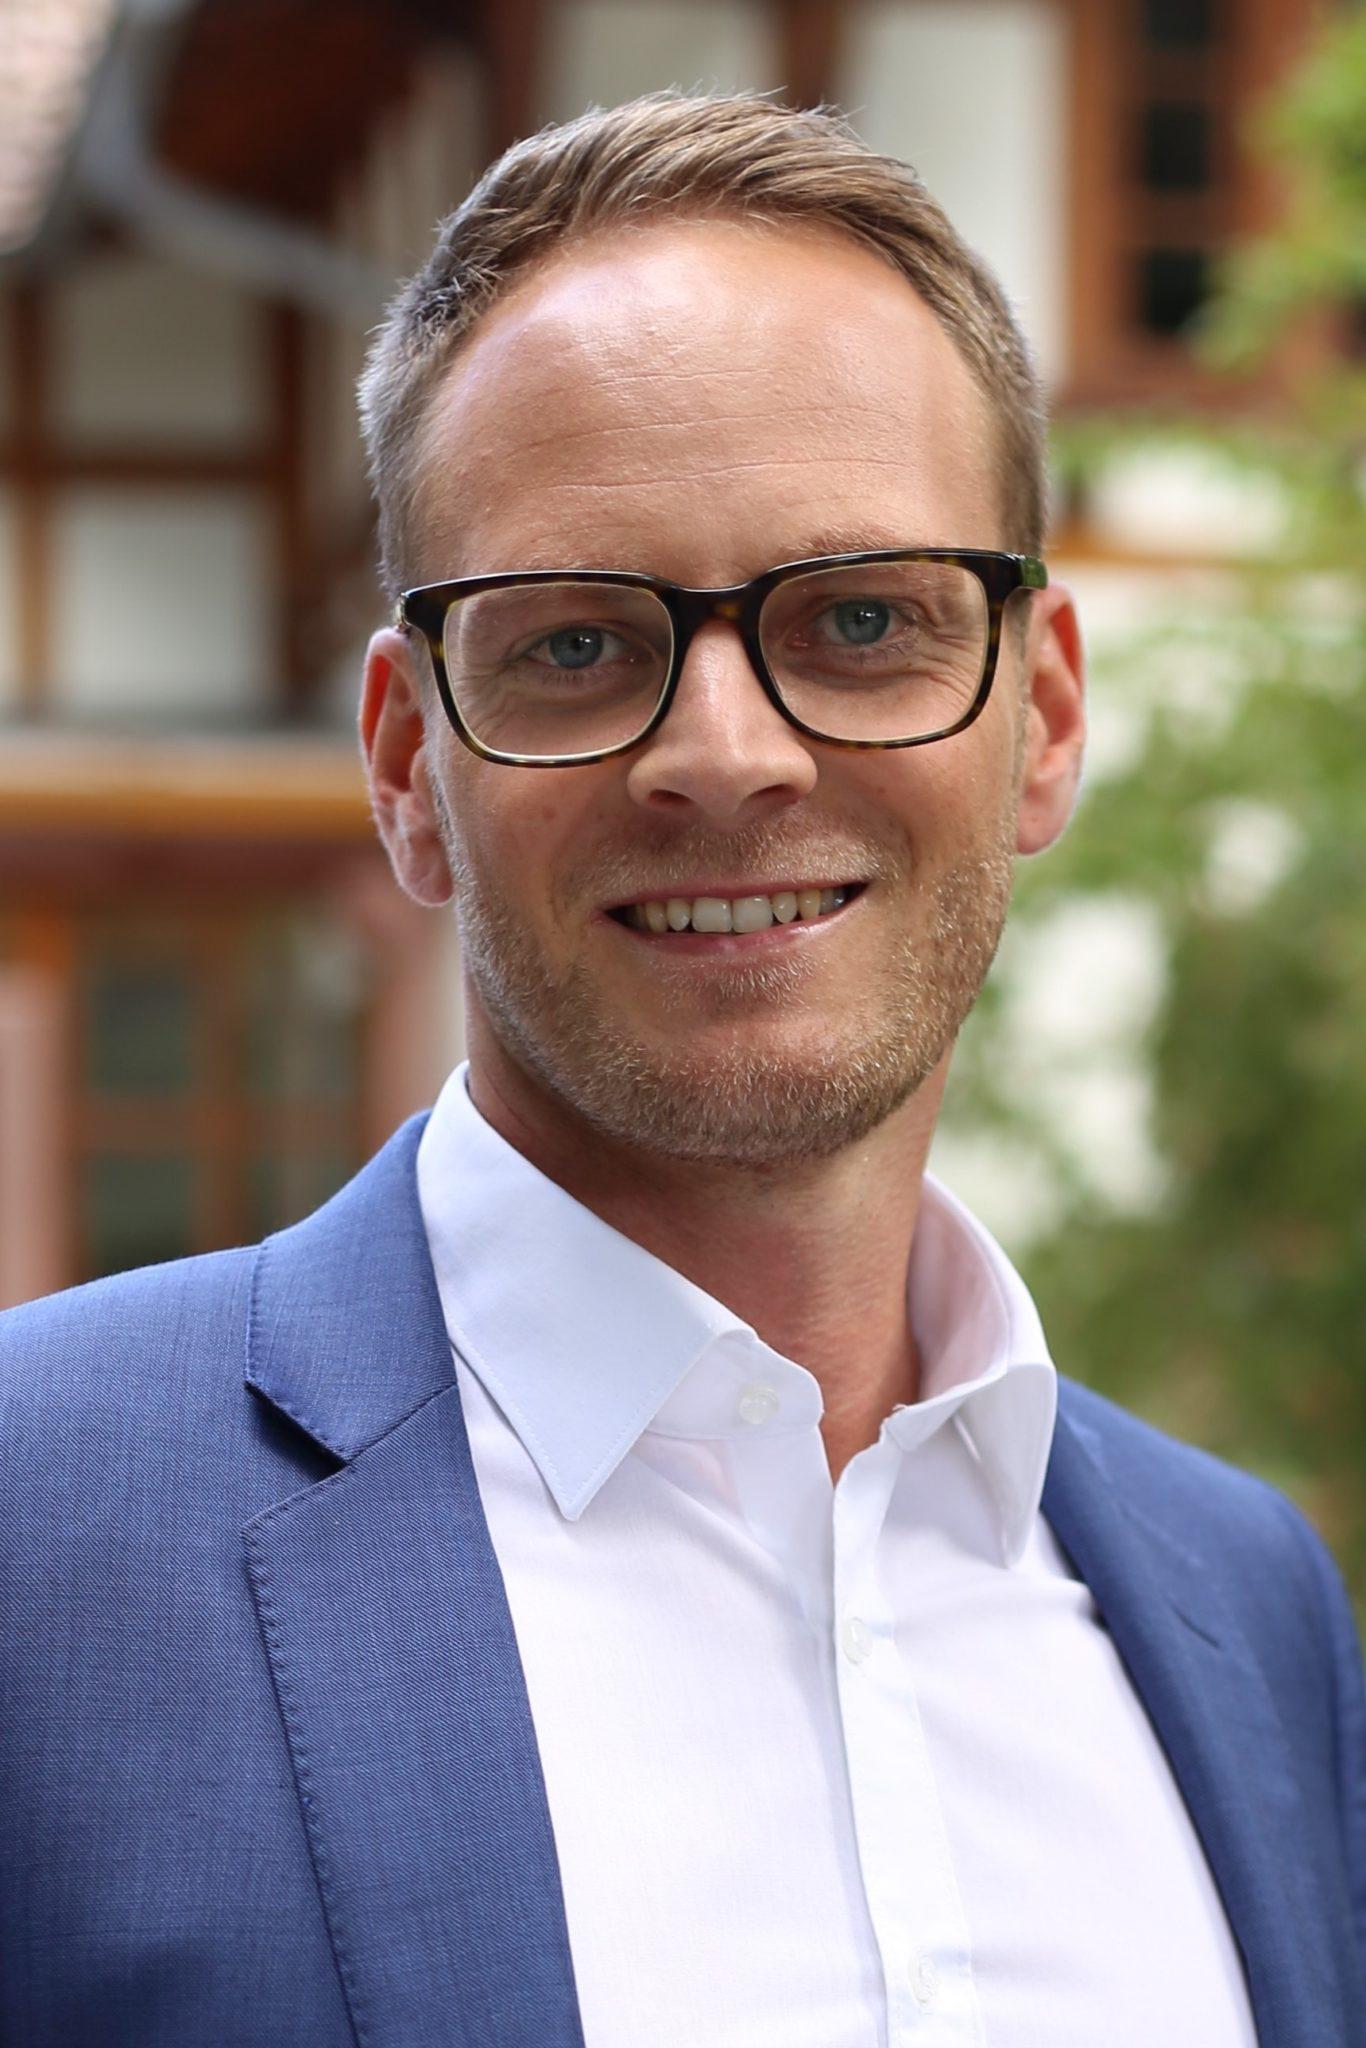 Daniel Fritzsche